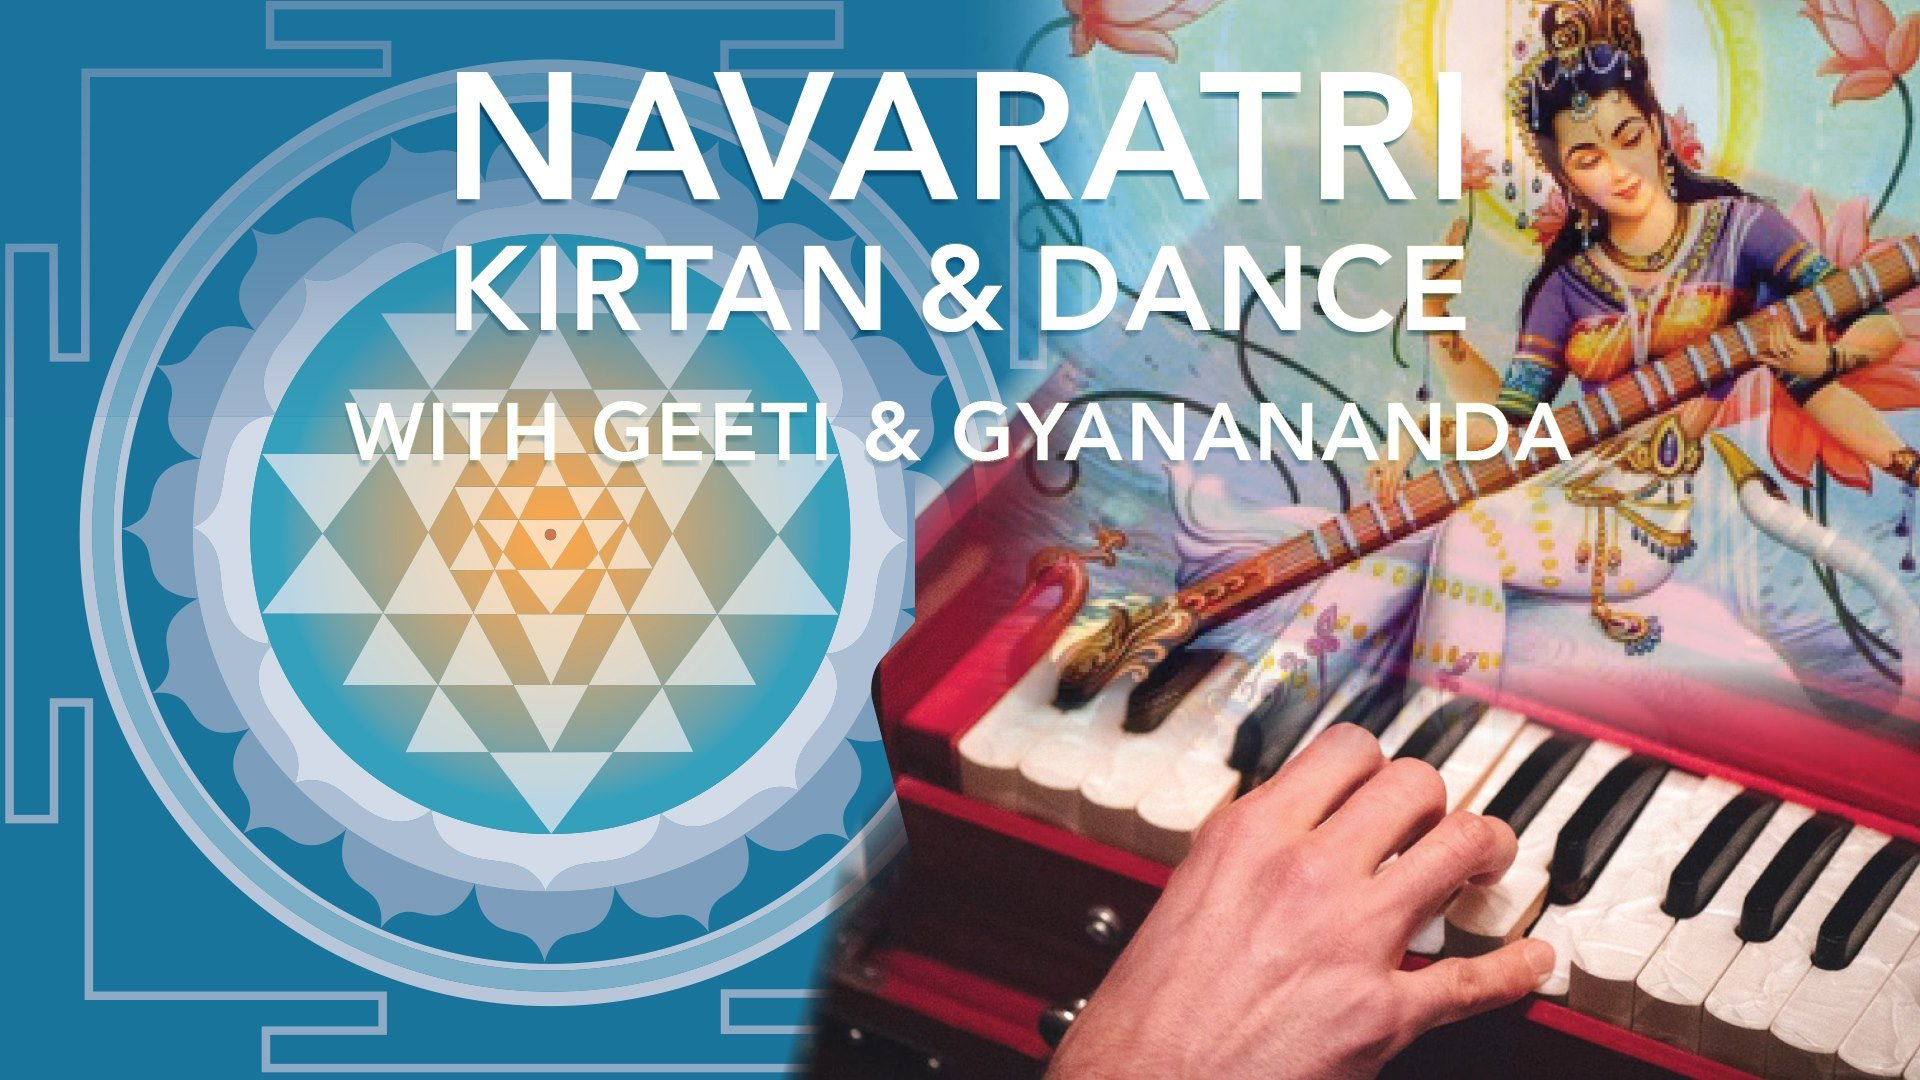 NAVARATRI KIRTAN & DANCE with Geeti and Gyan